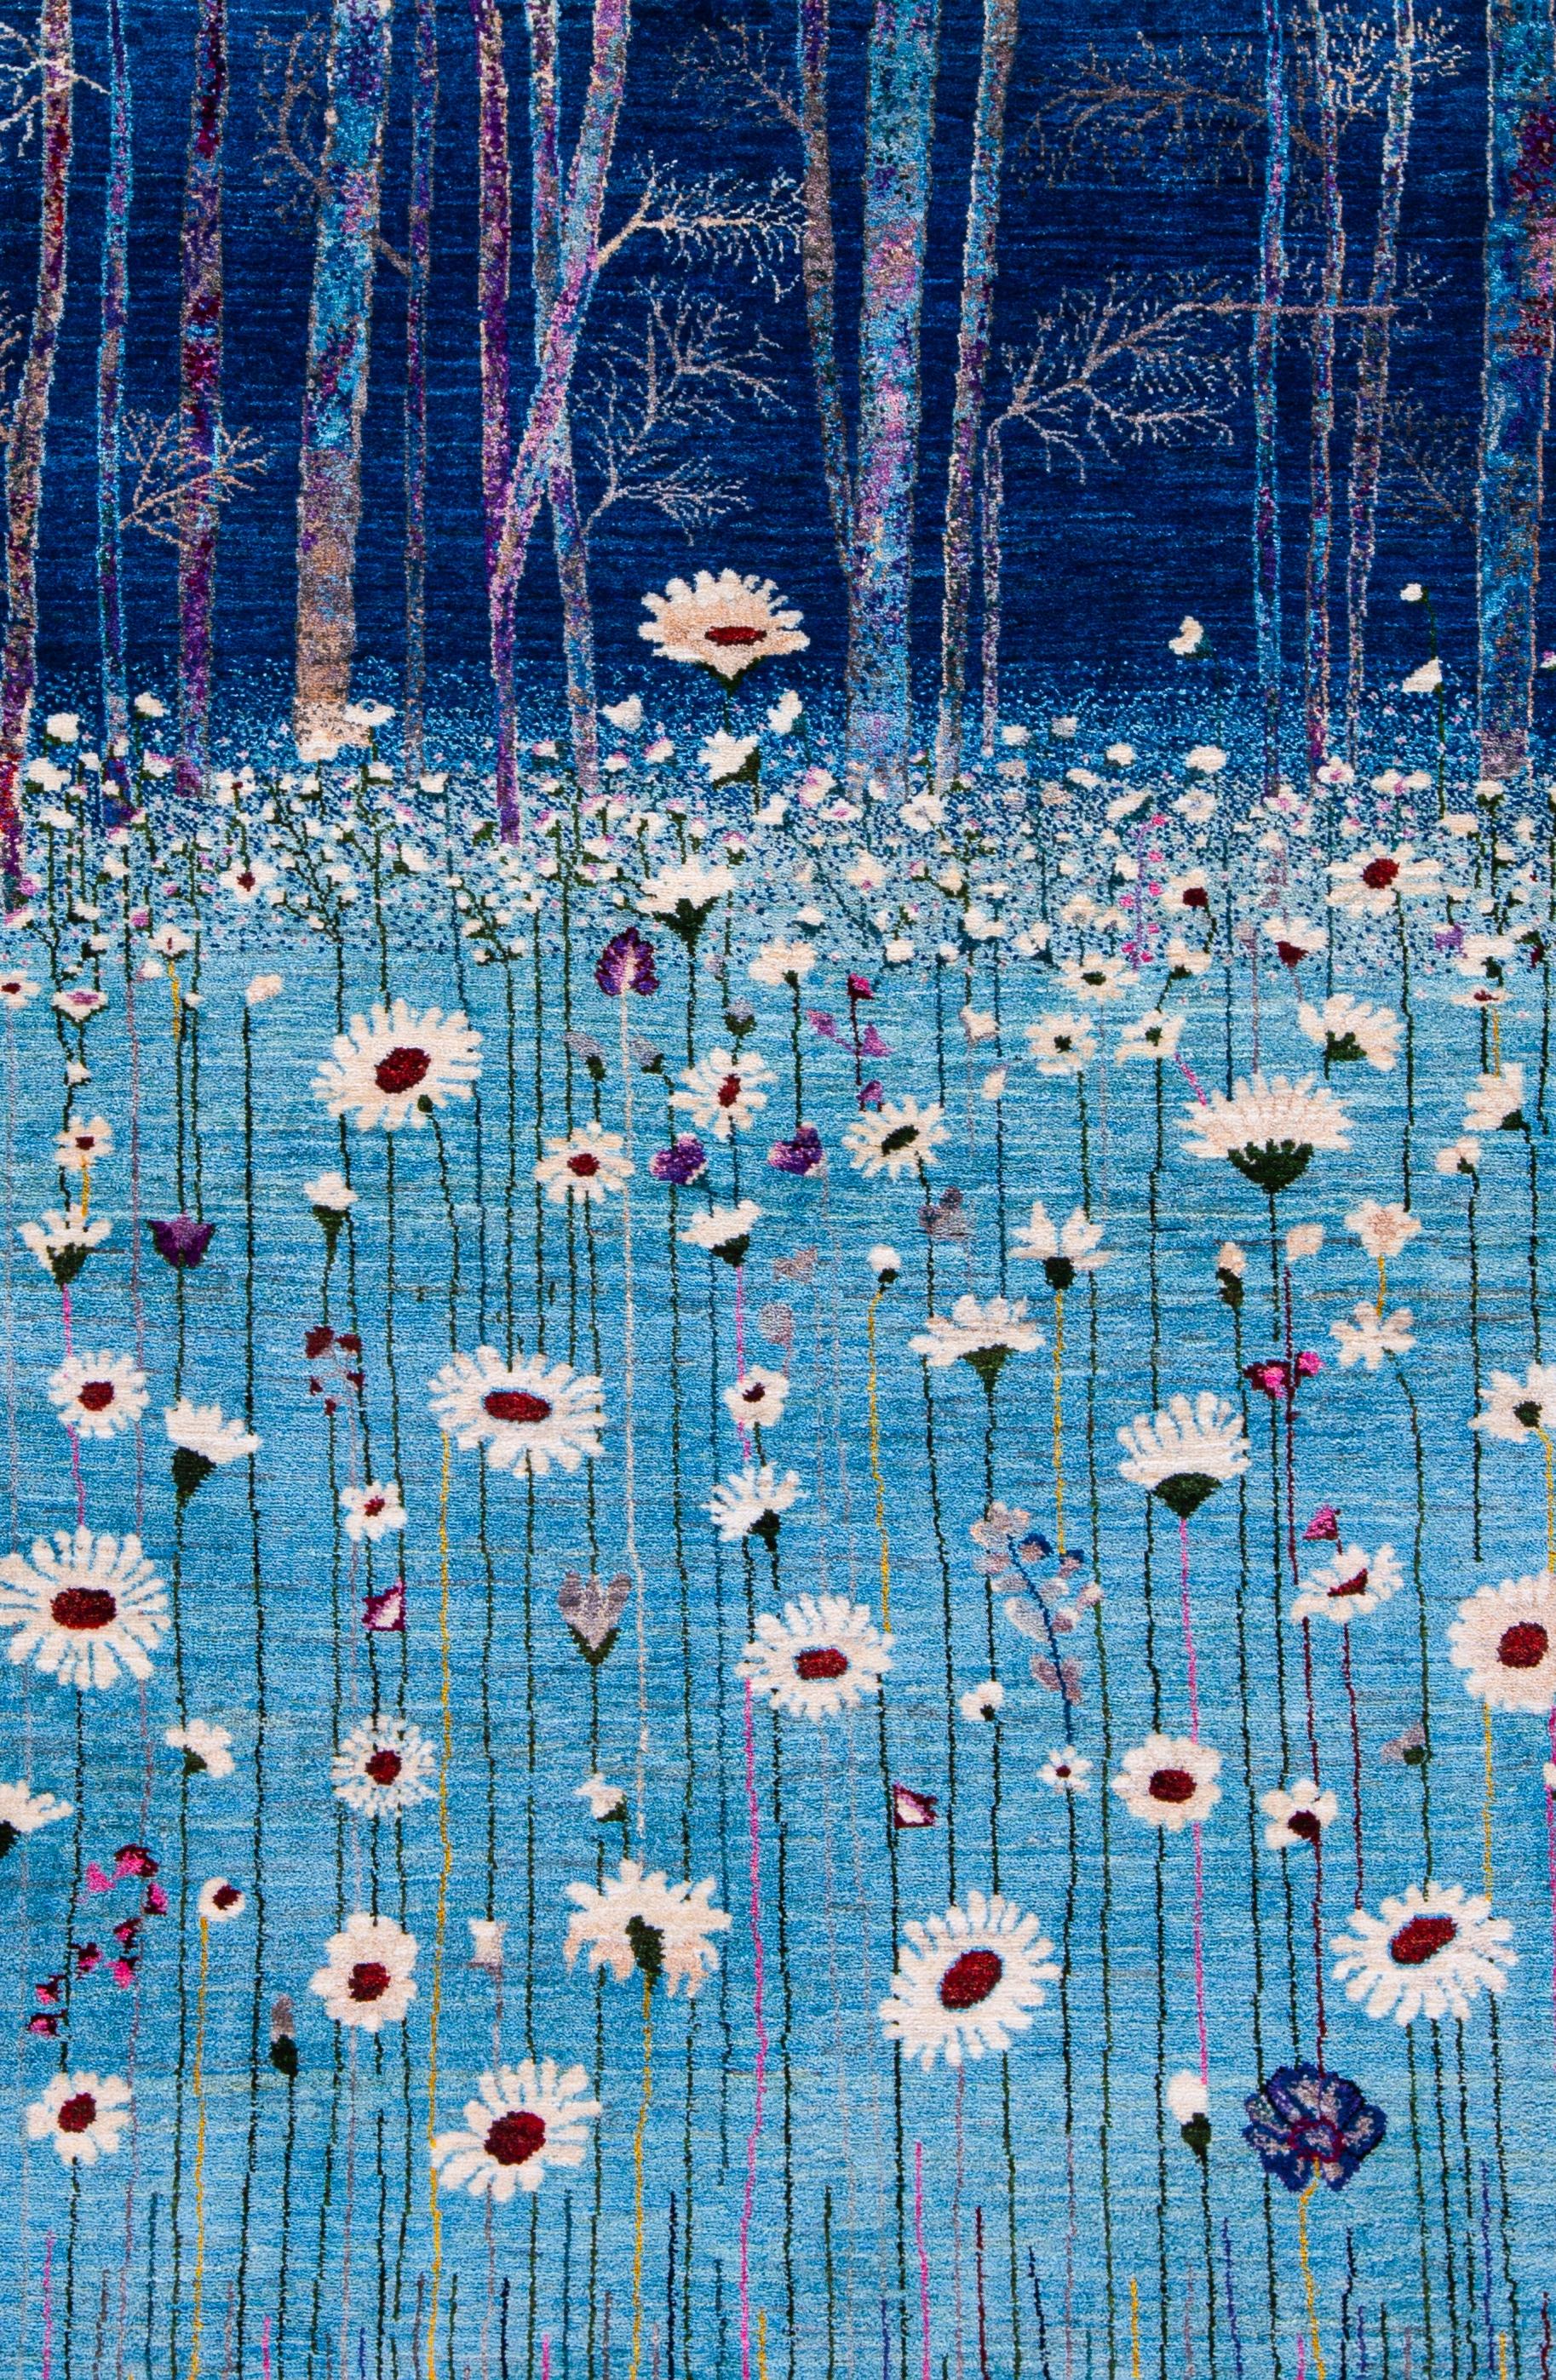 Flower Meadow 3 Zollanvari Studio Luribaft 107 x 160cm